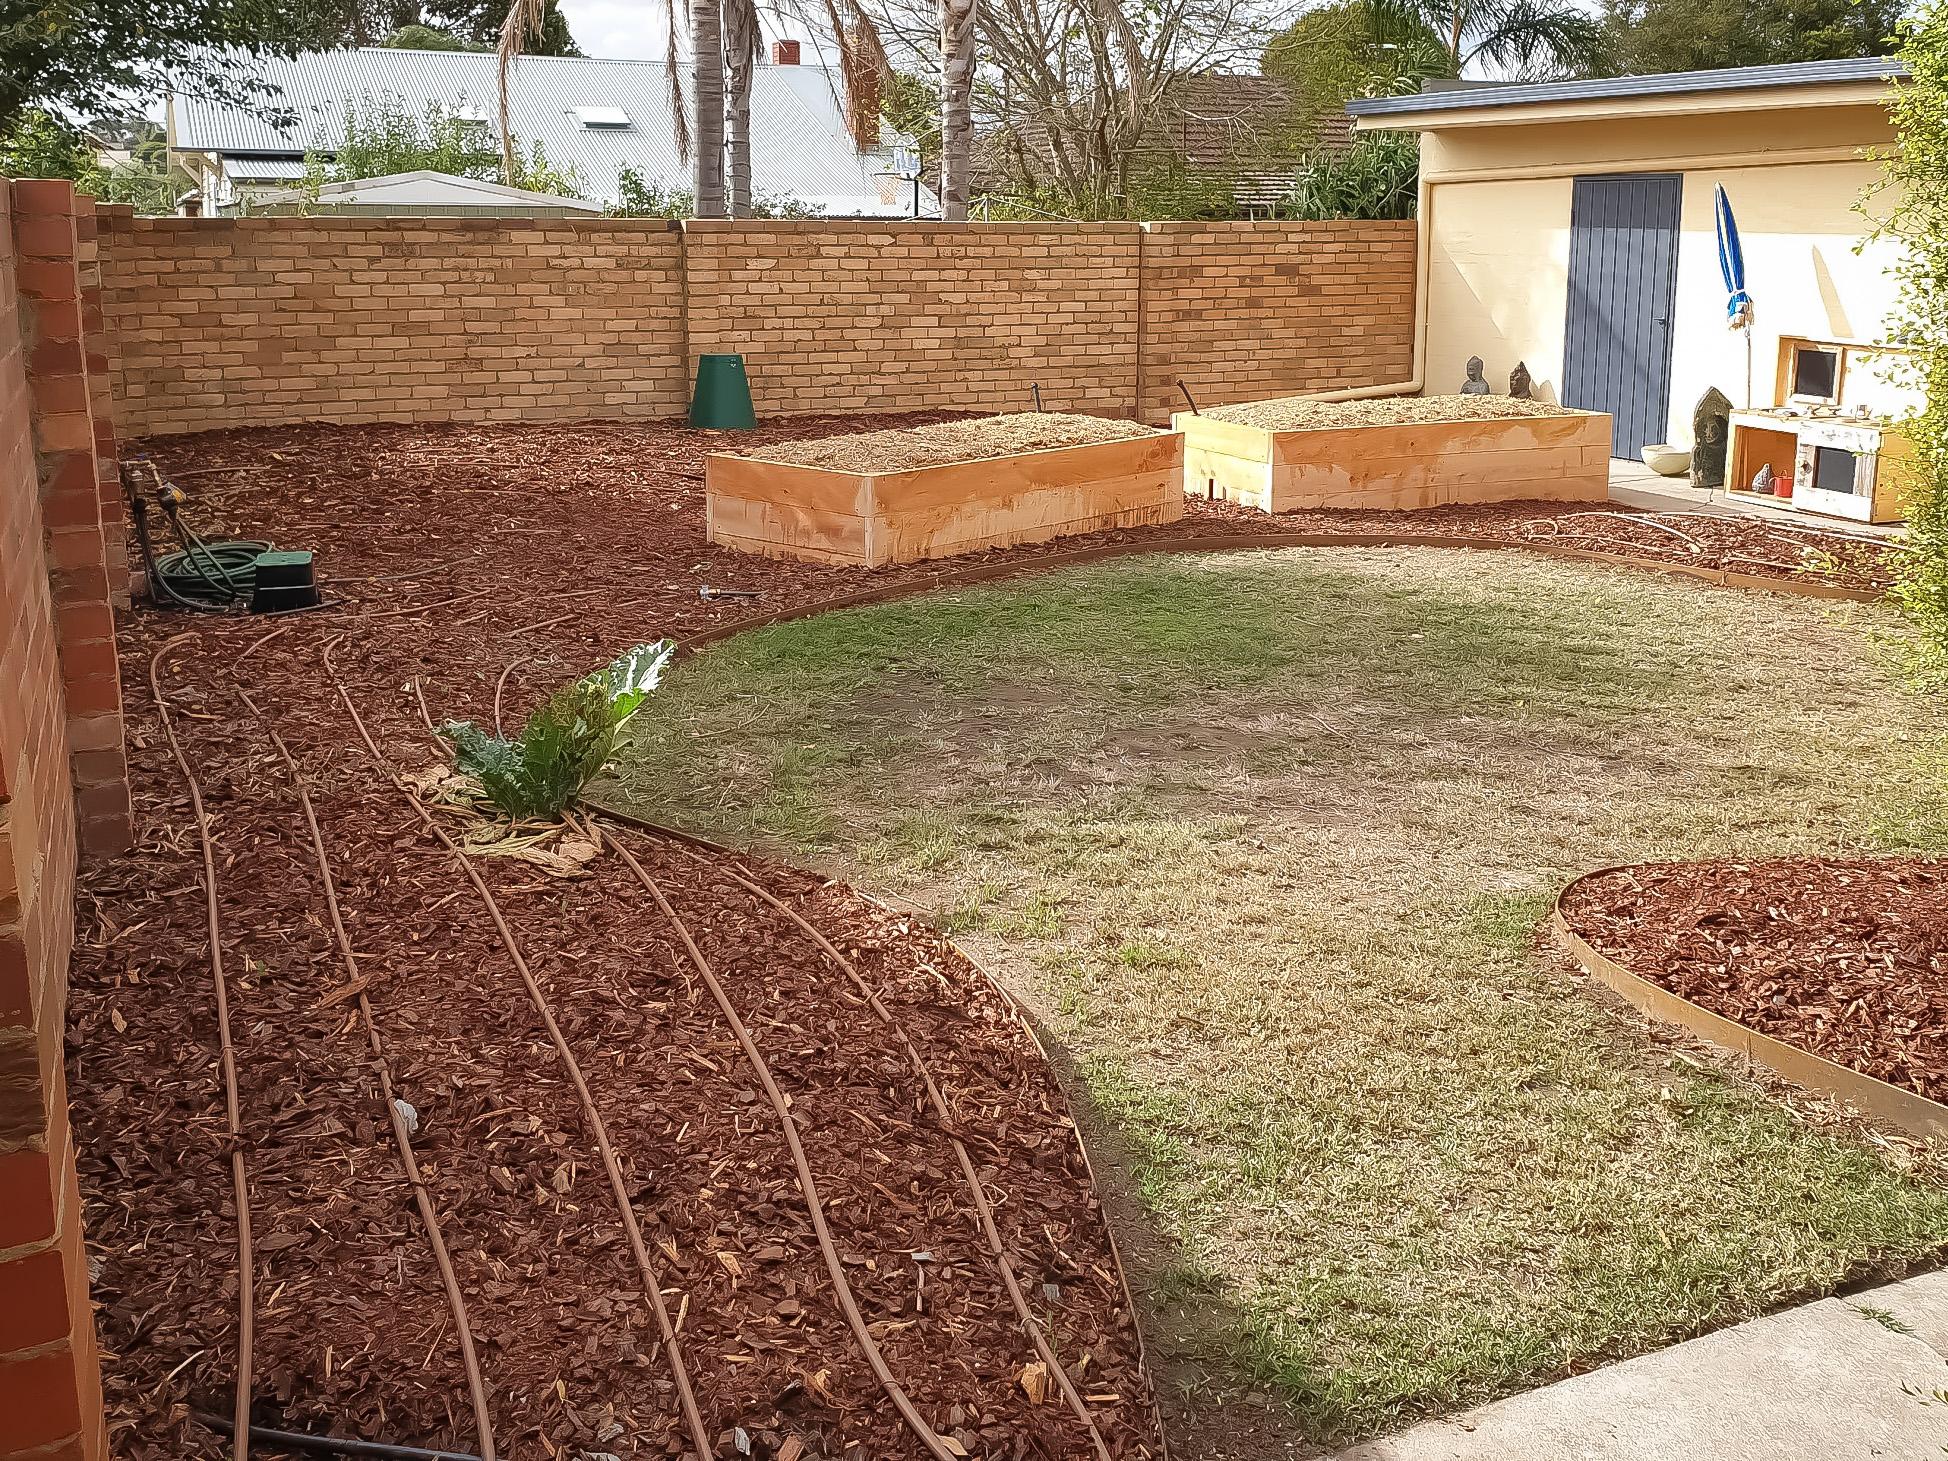 Garden makover with wicking beds Preston